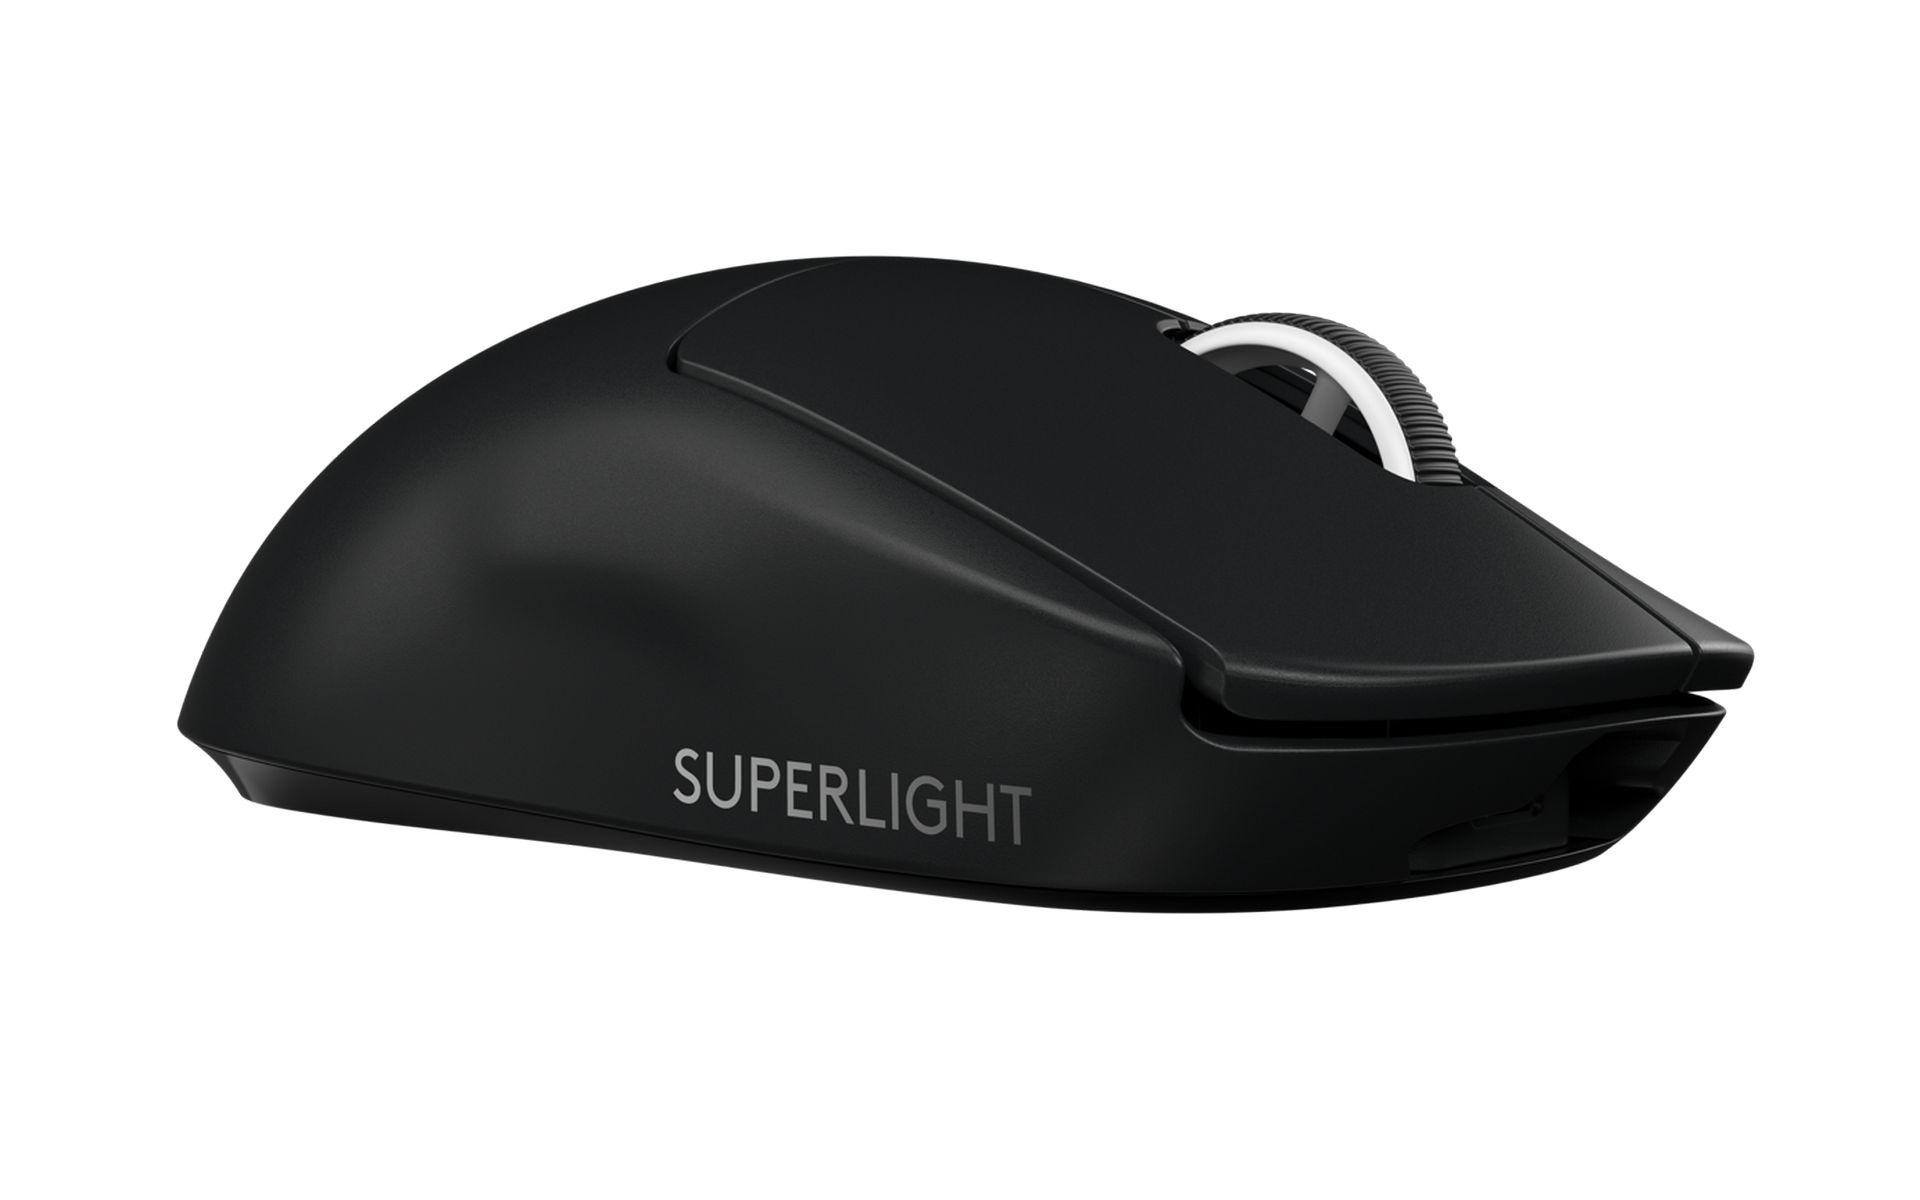 Logitech Pro X Superlight Black